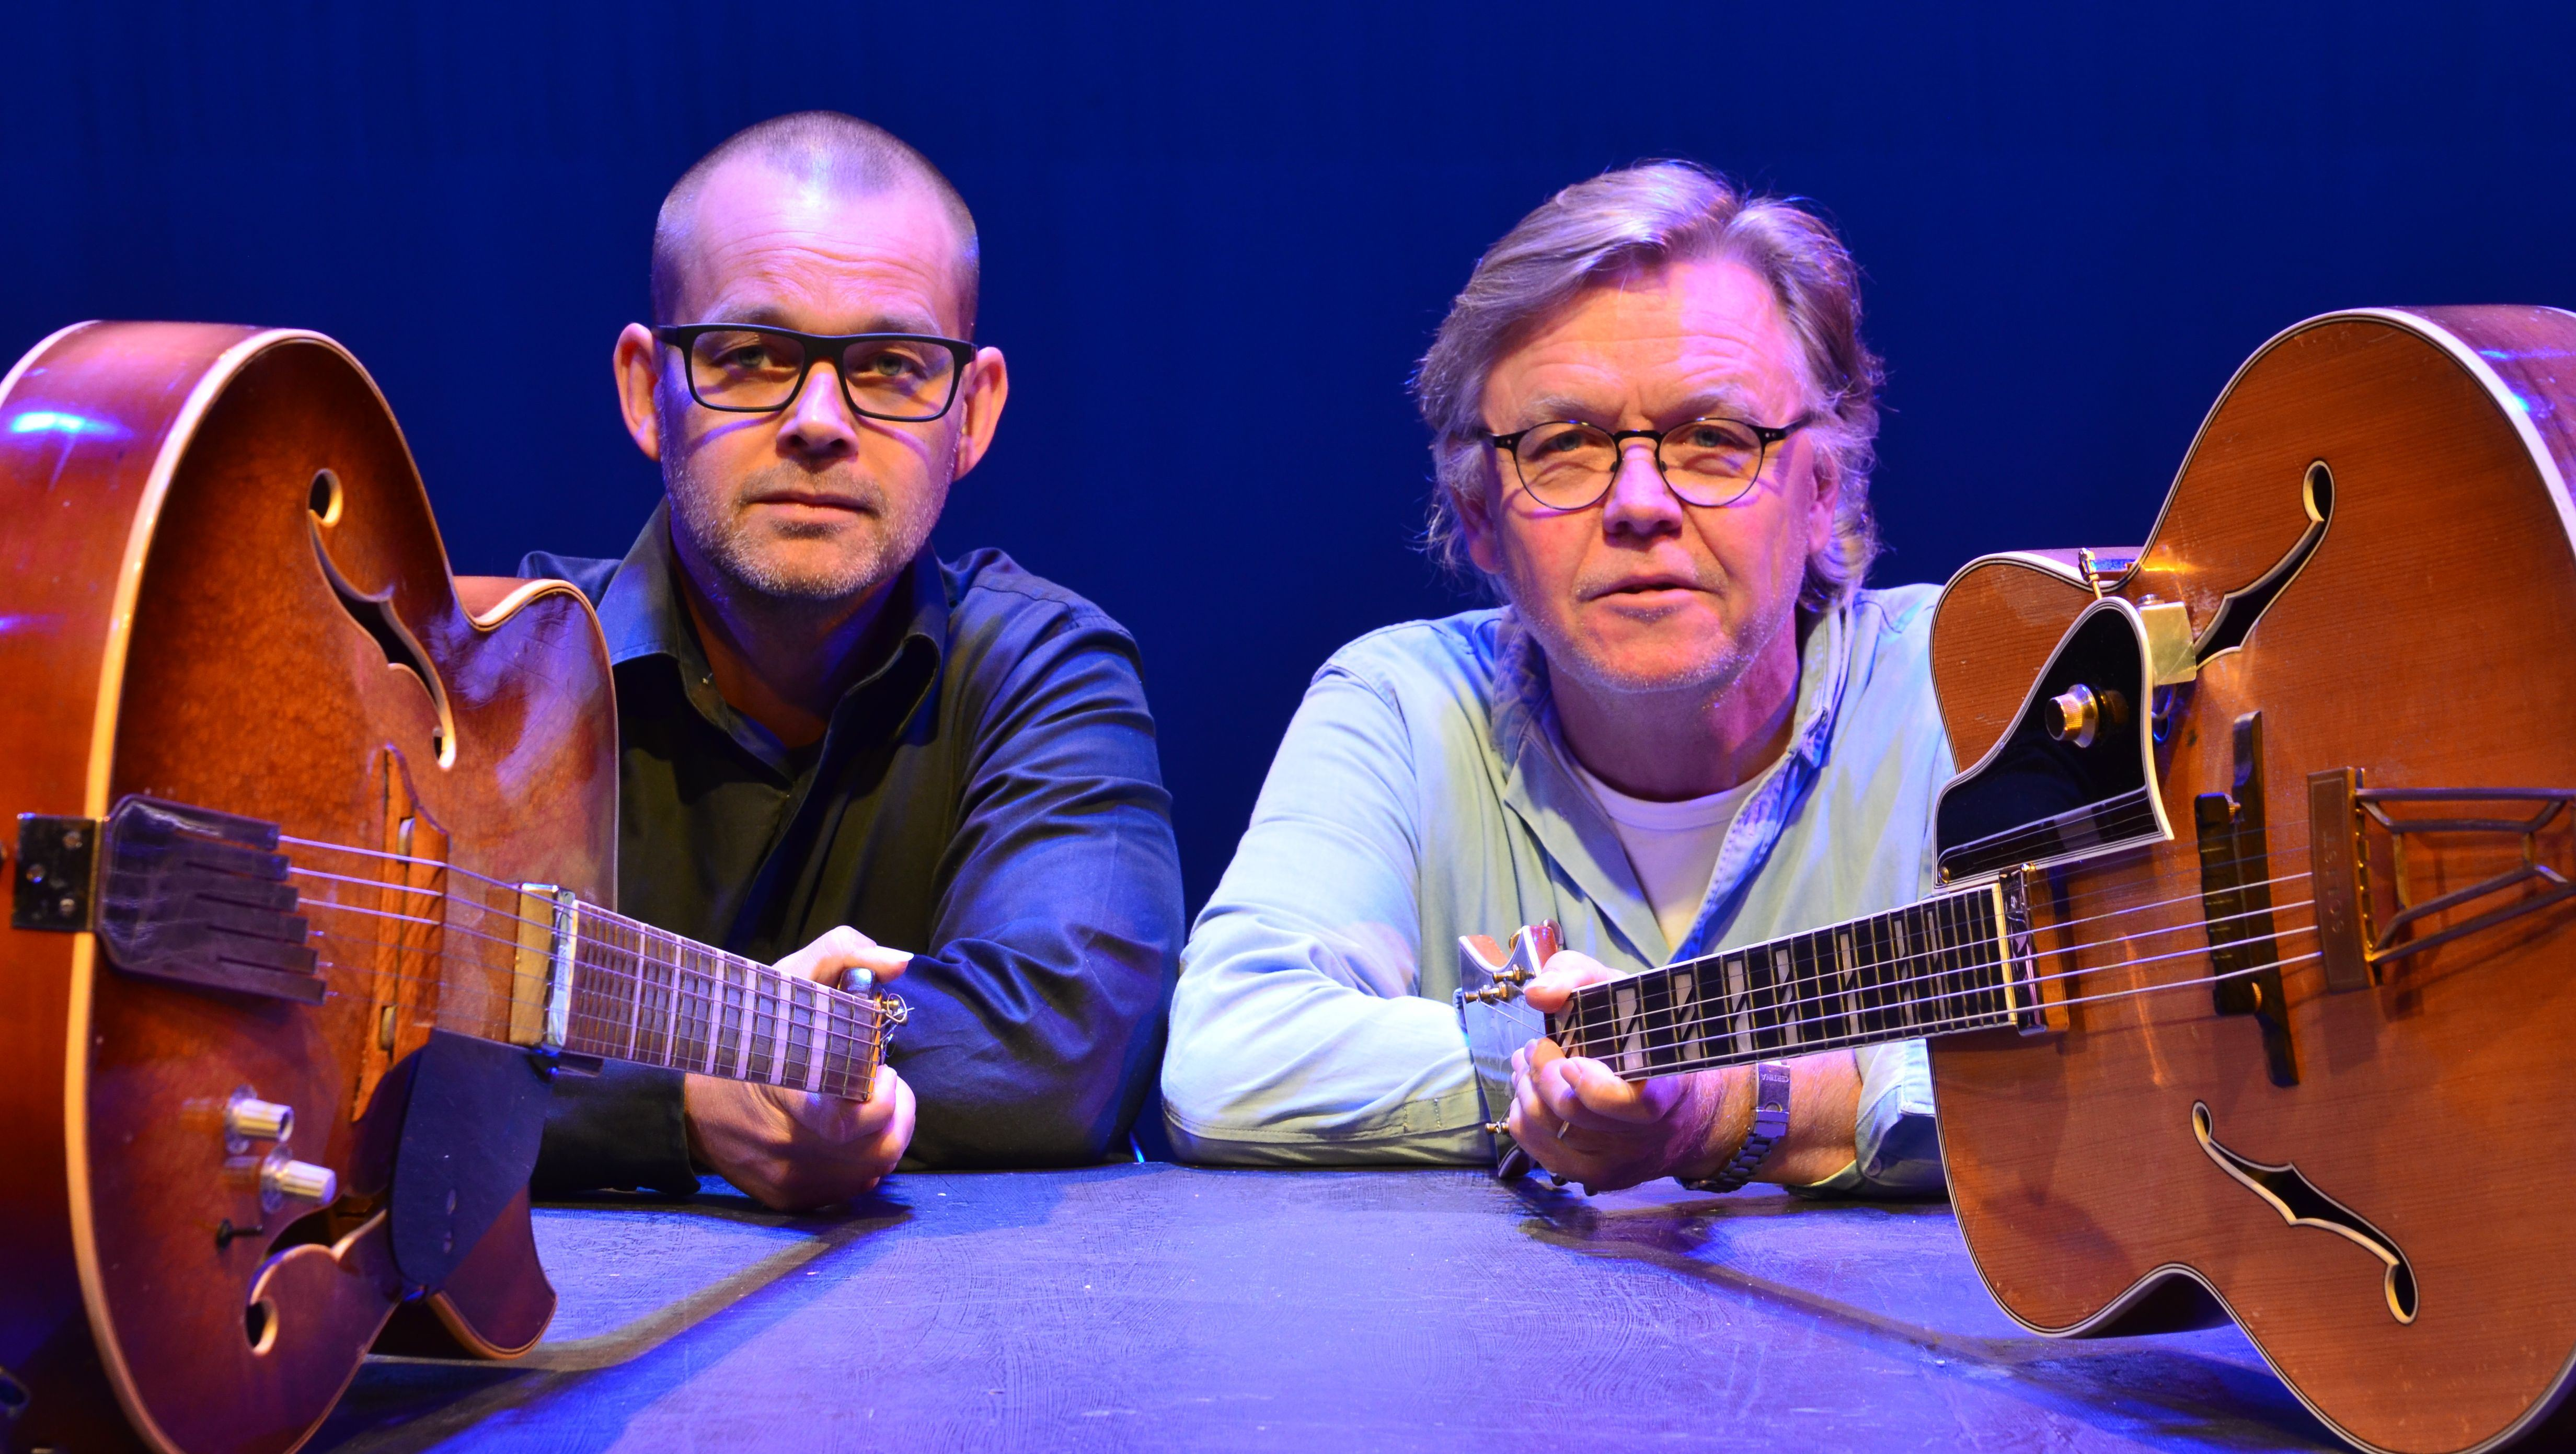 Lunchkonsert: Lars Bohlin och Magnus Karlsson, gitarr